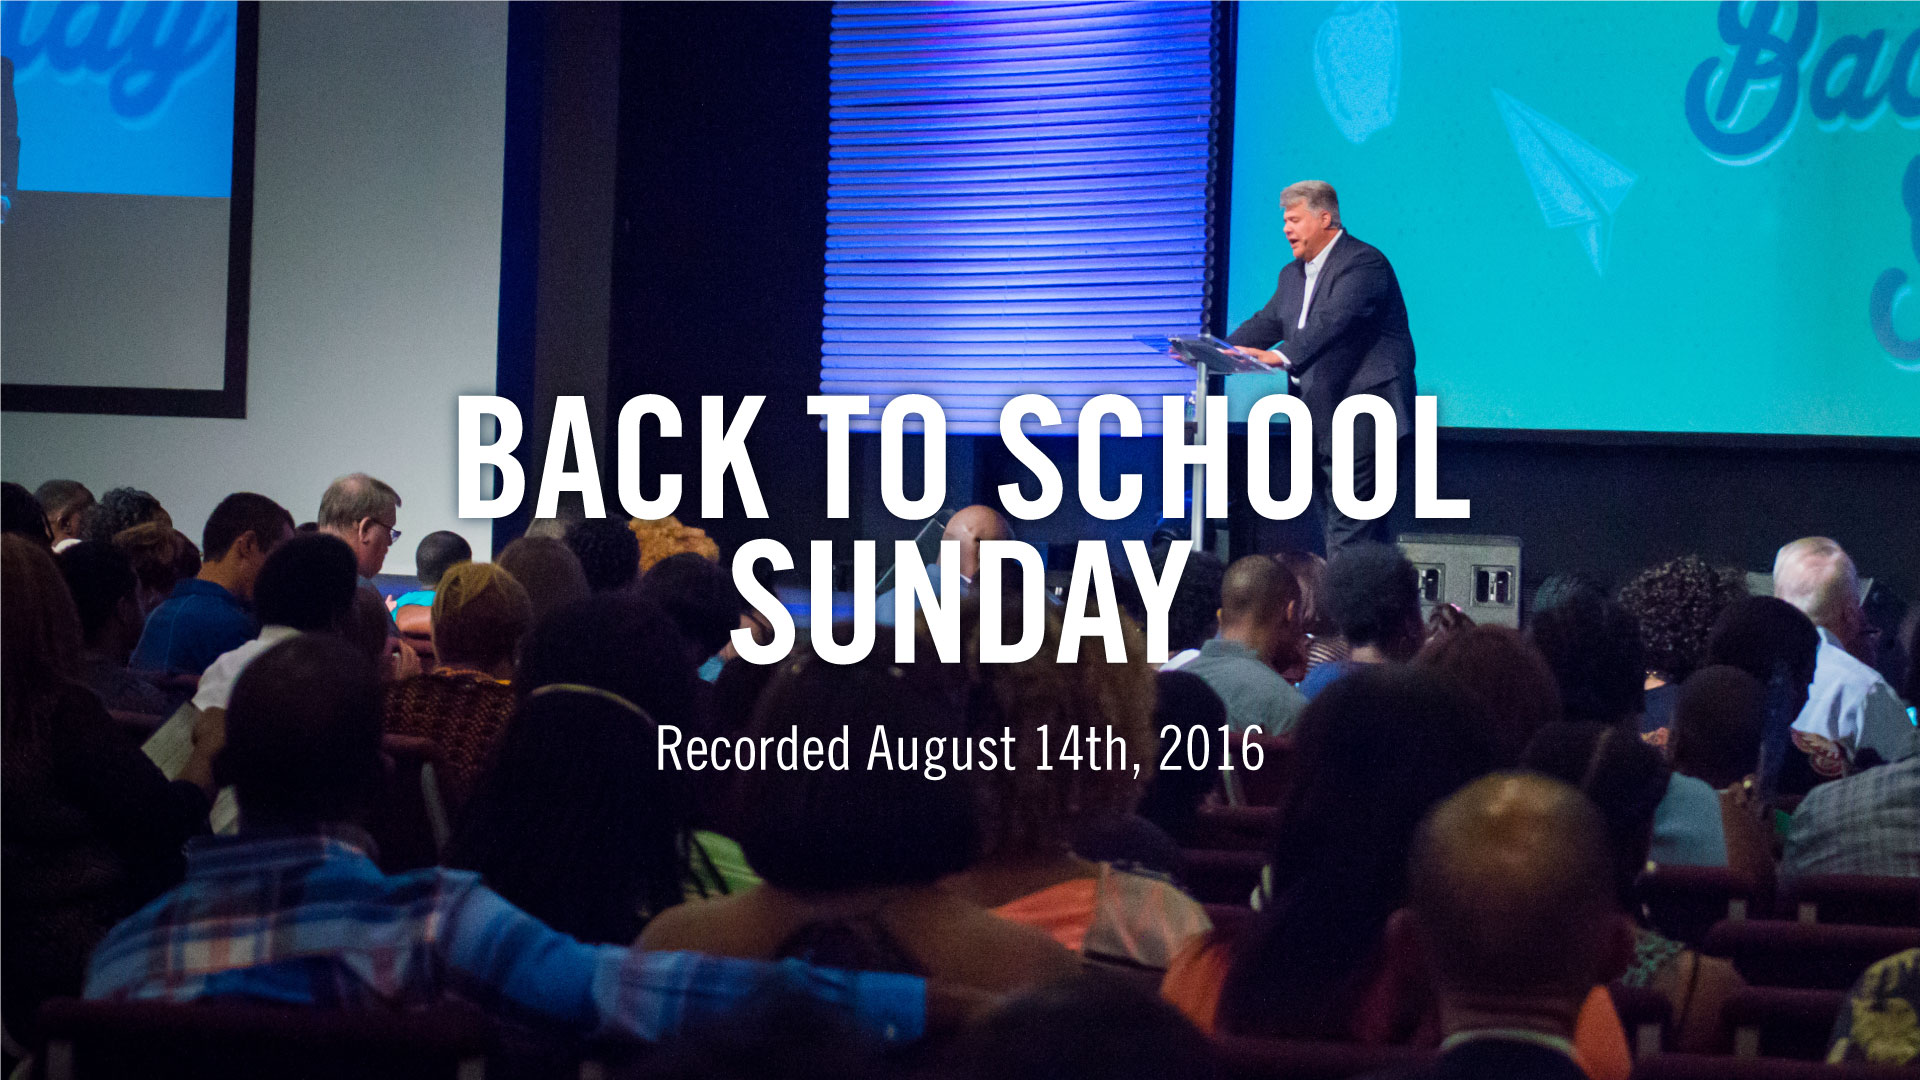 Back-to-School-Sunday_Theme_Pastor-Steve-McCartt-Family-Worship-Center-Florence_web